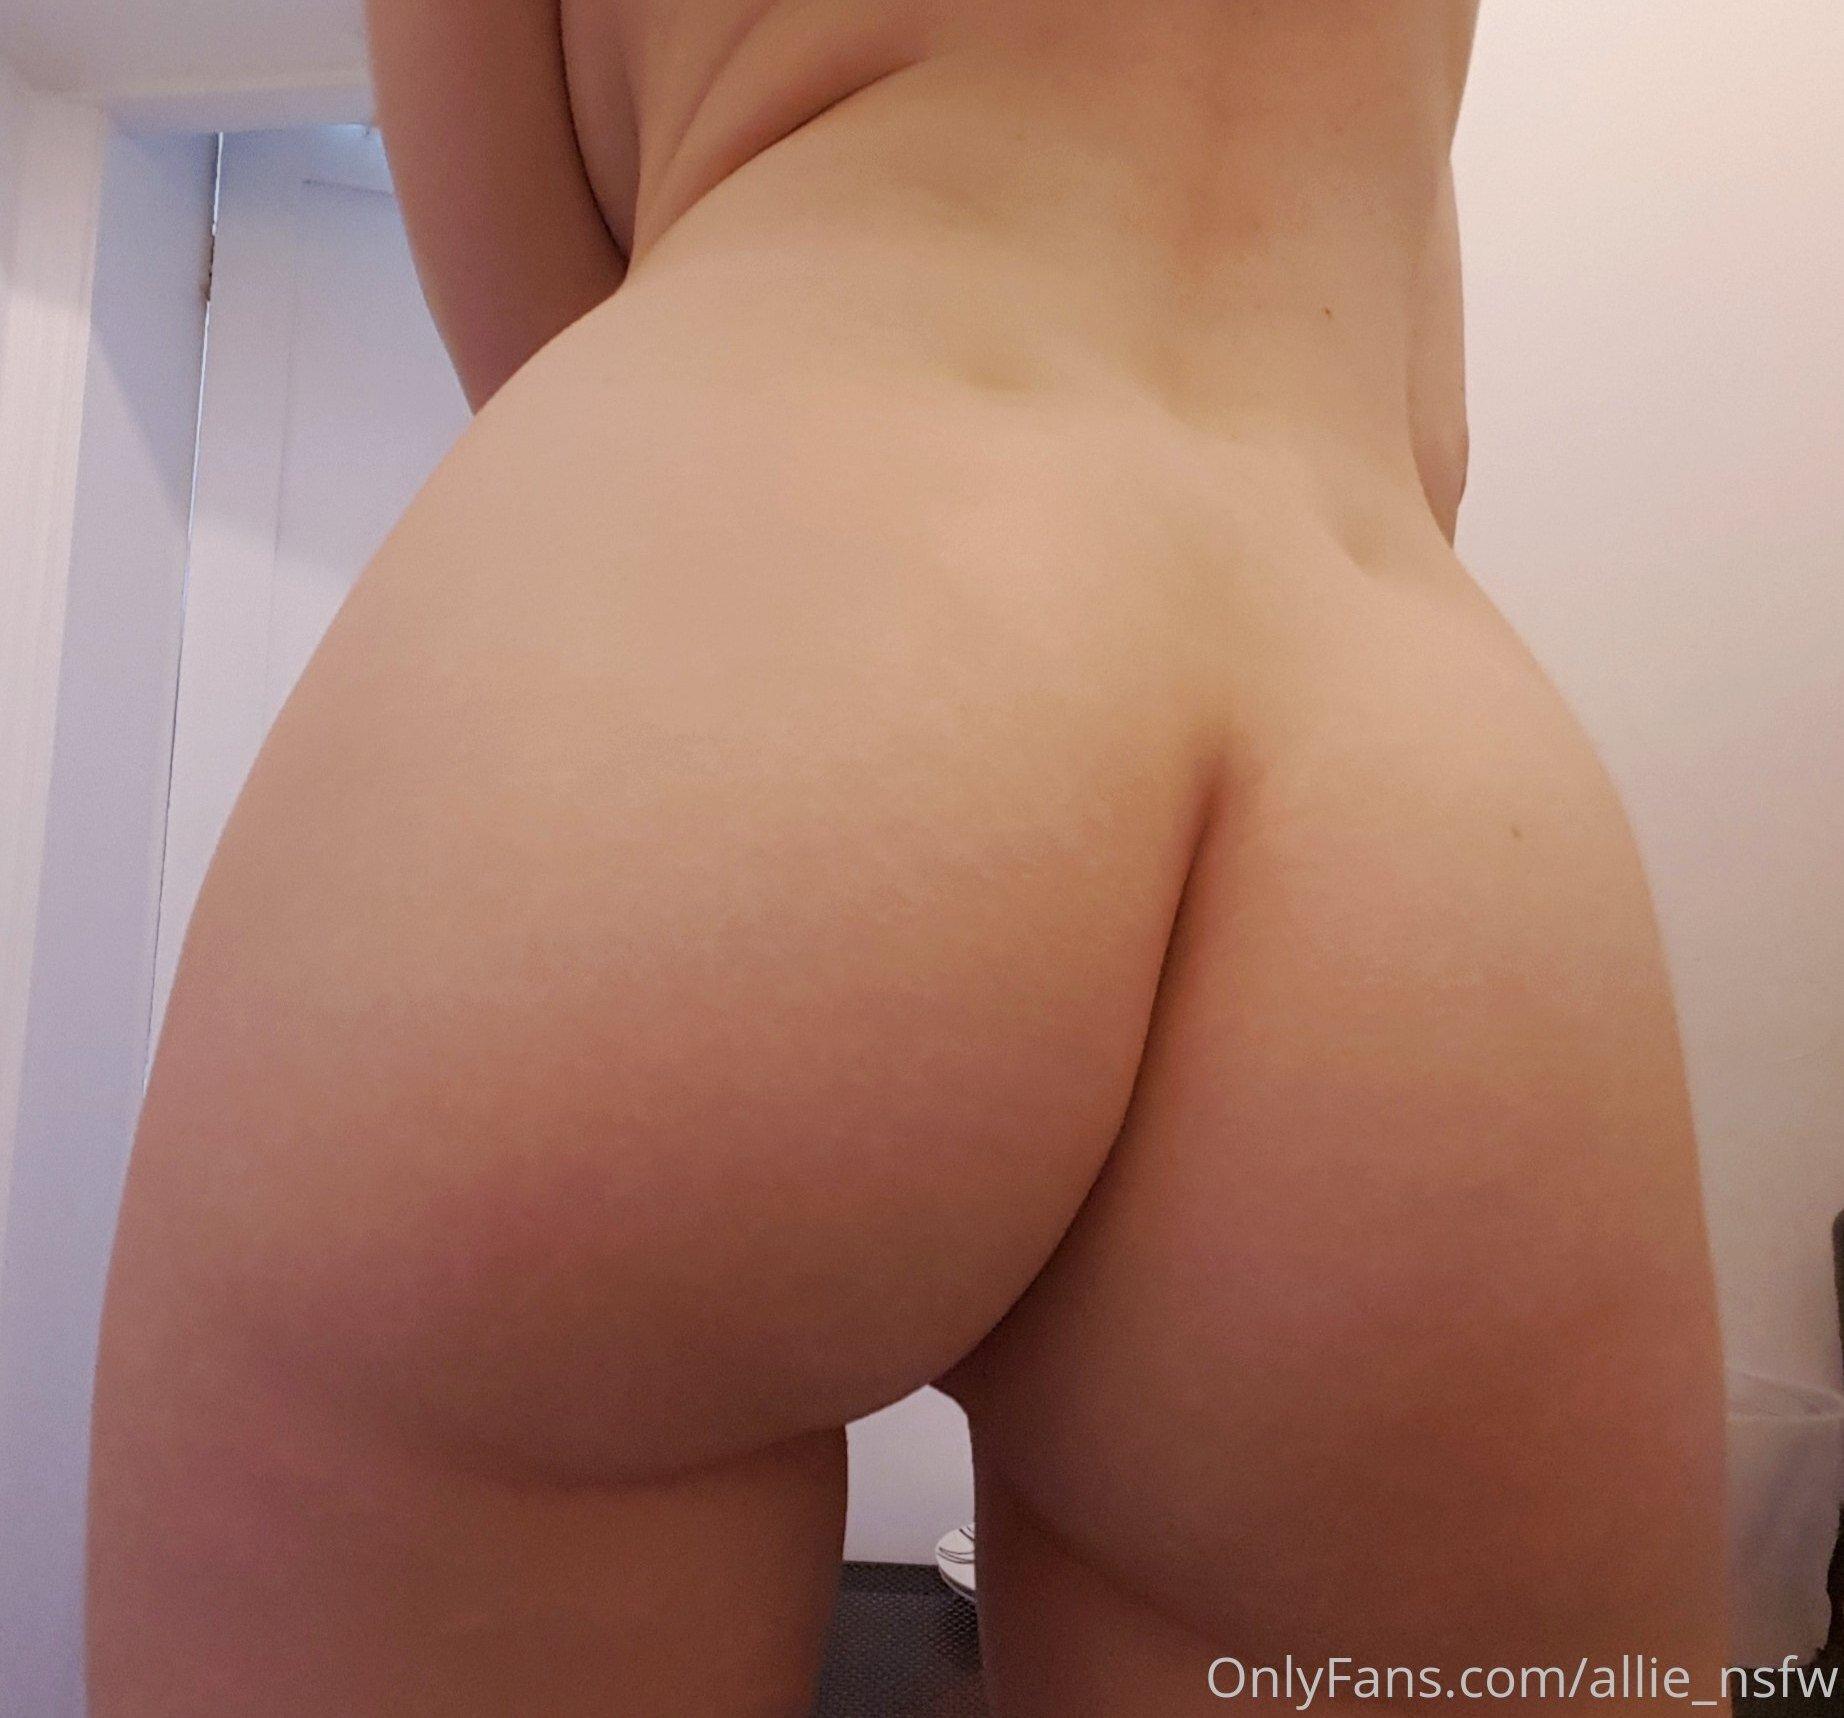 Allie Alliensfw Onlyfans Nude Leaks 0011